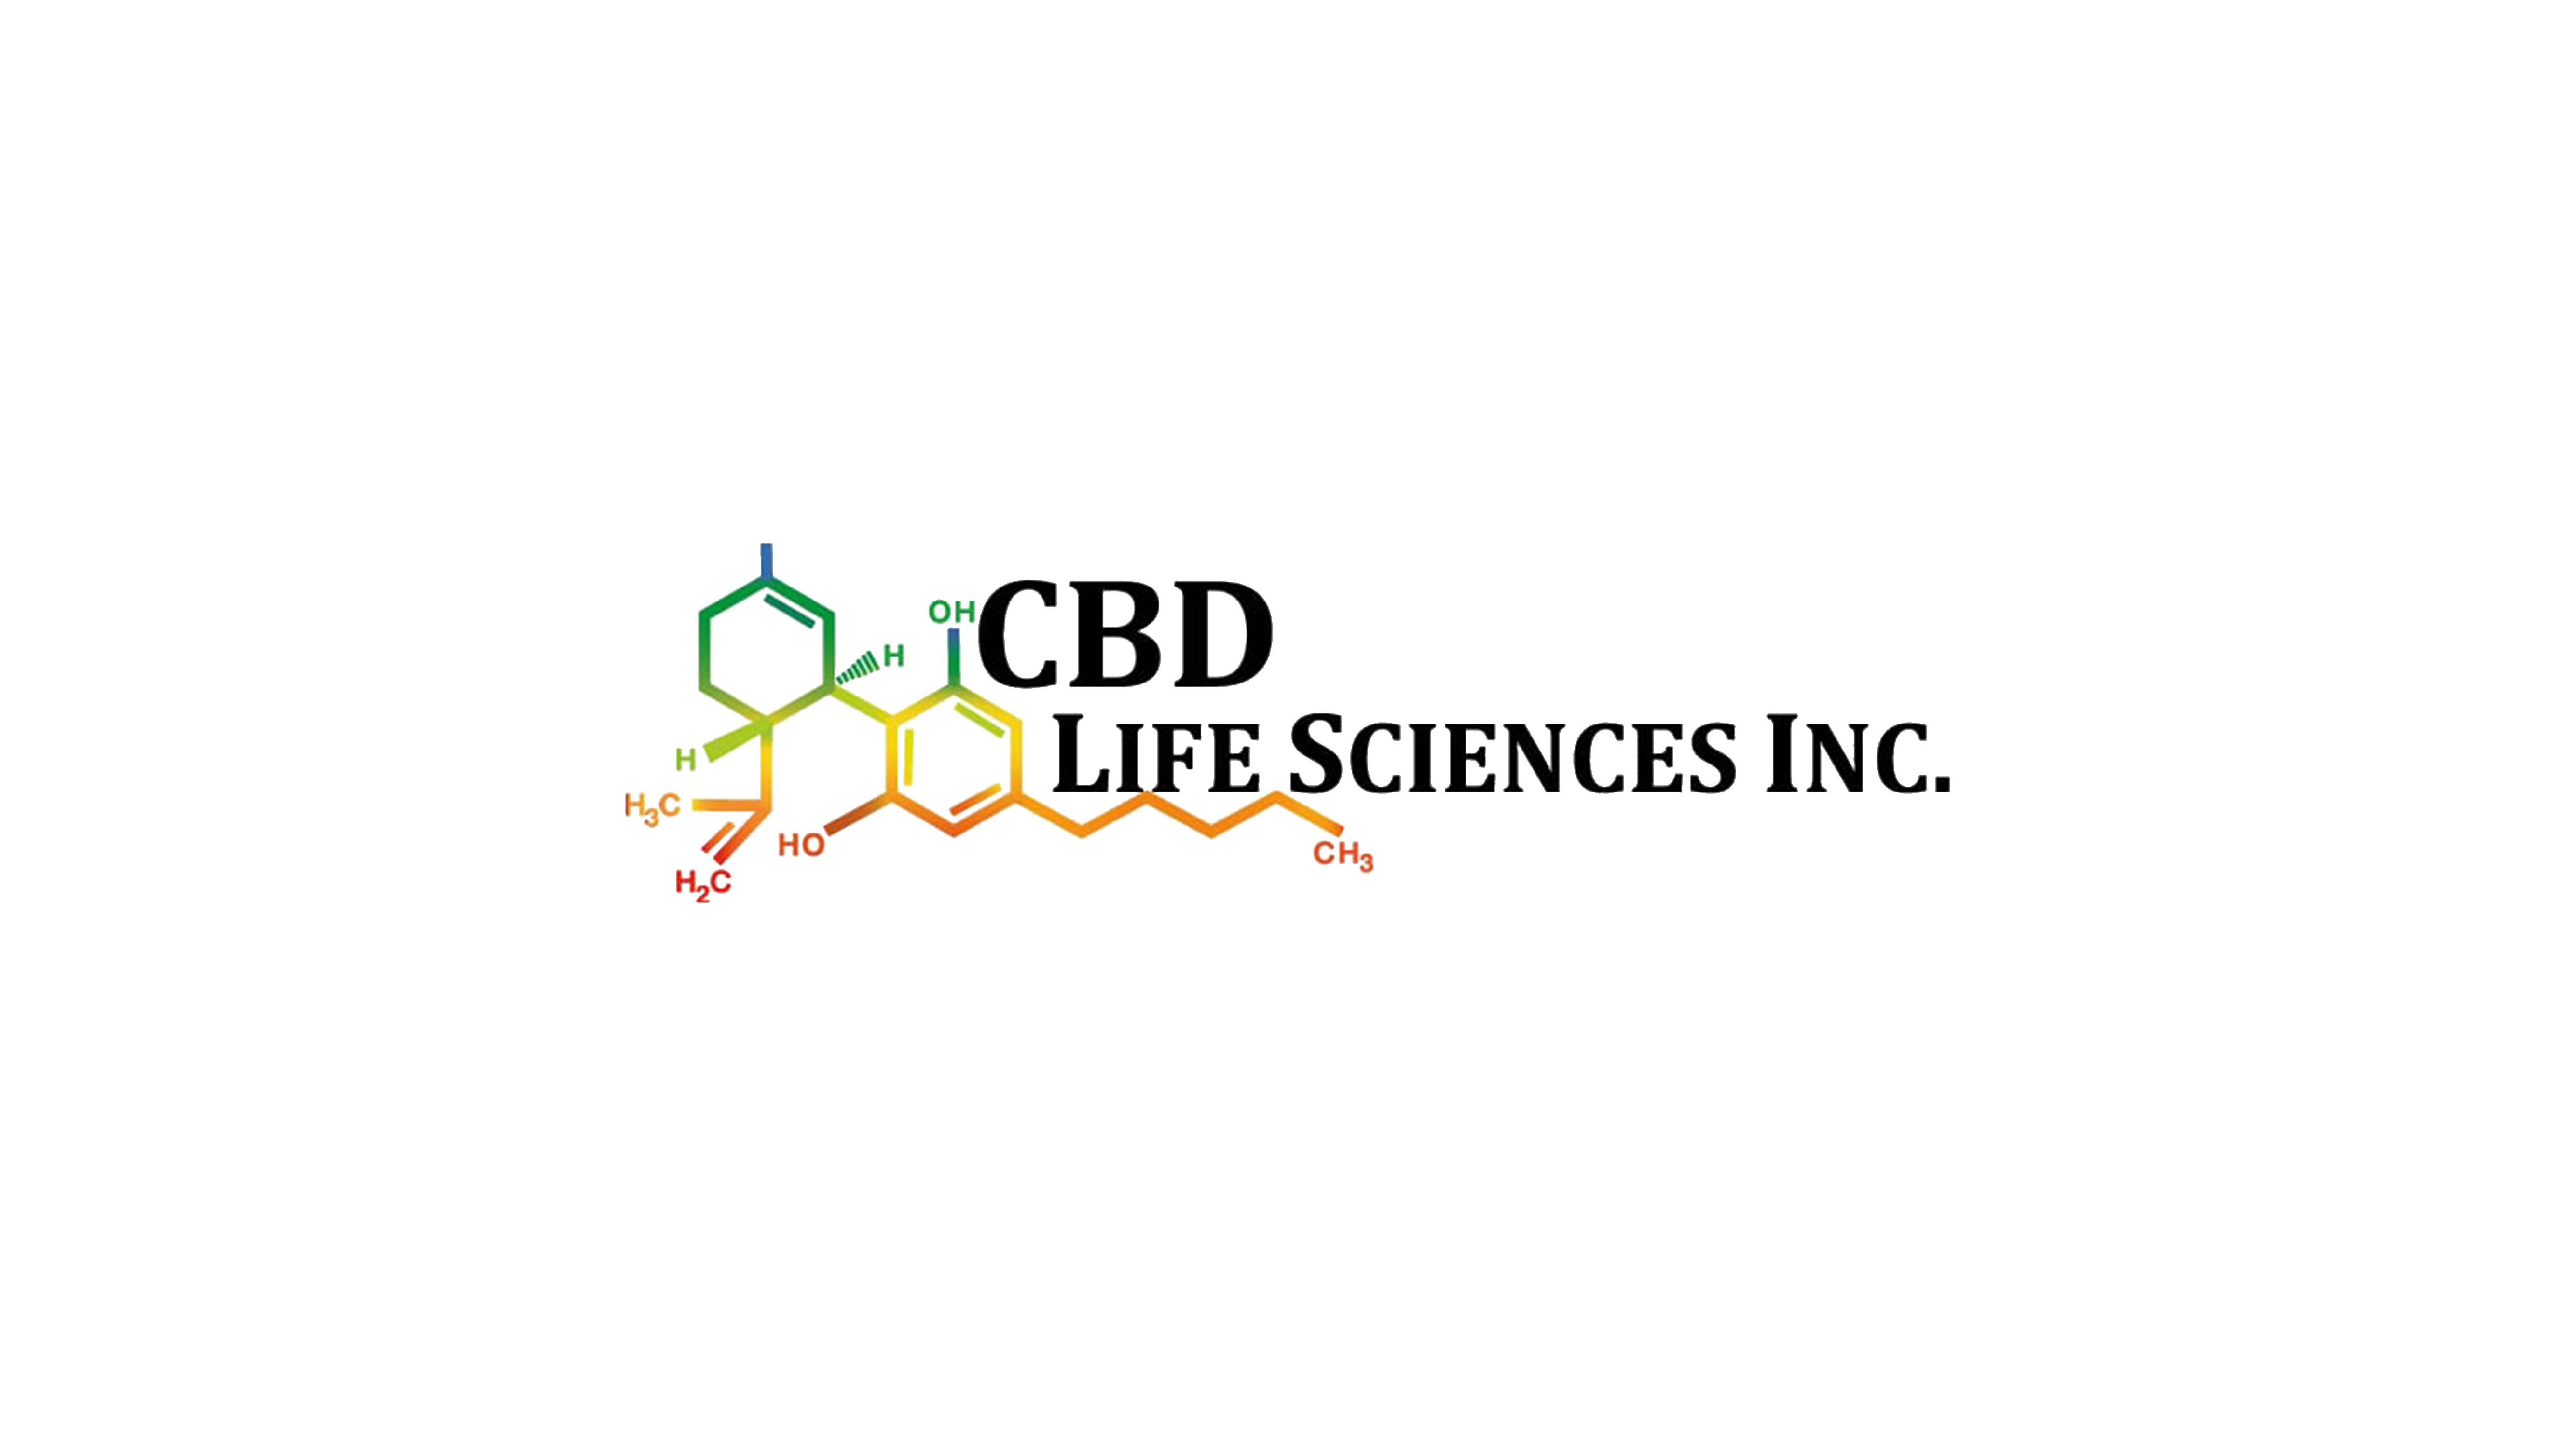 CBD Life Sciences, Inc. (CBDL) Issues Strategic Corporate Overview.